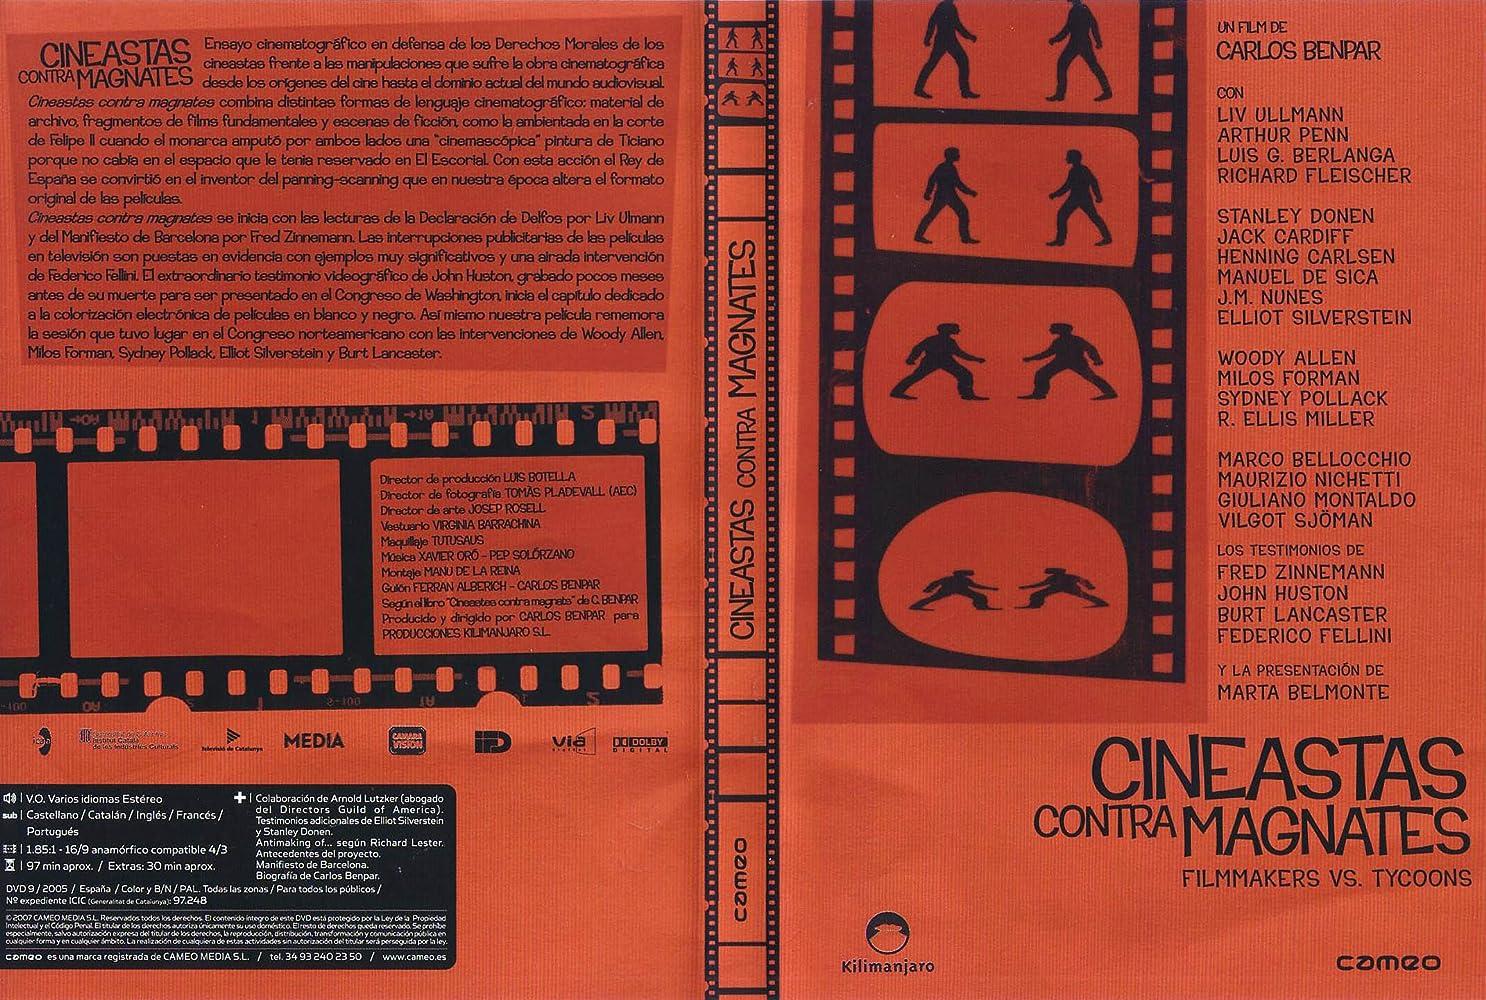 Cineastas contra magnates (2005)